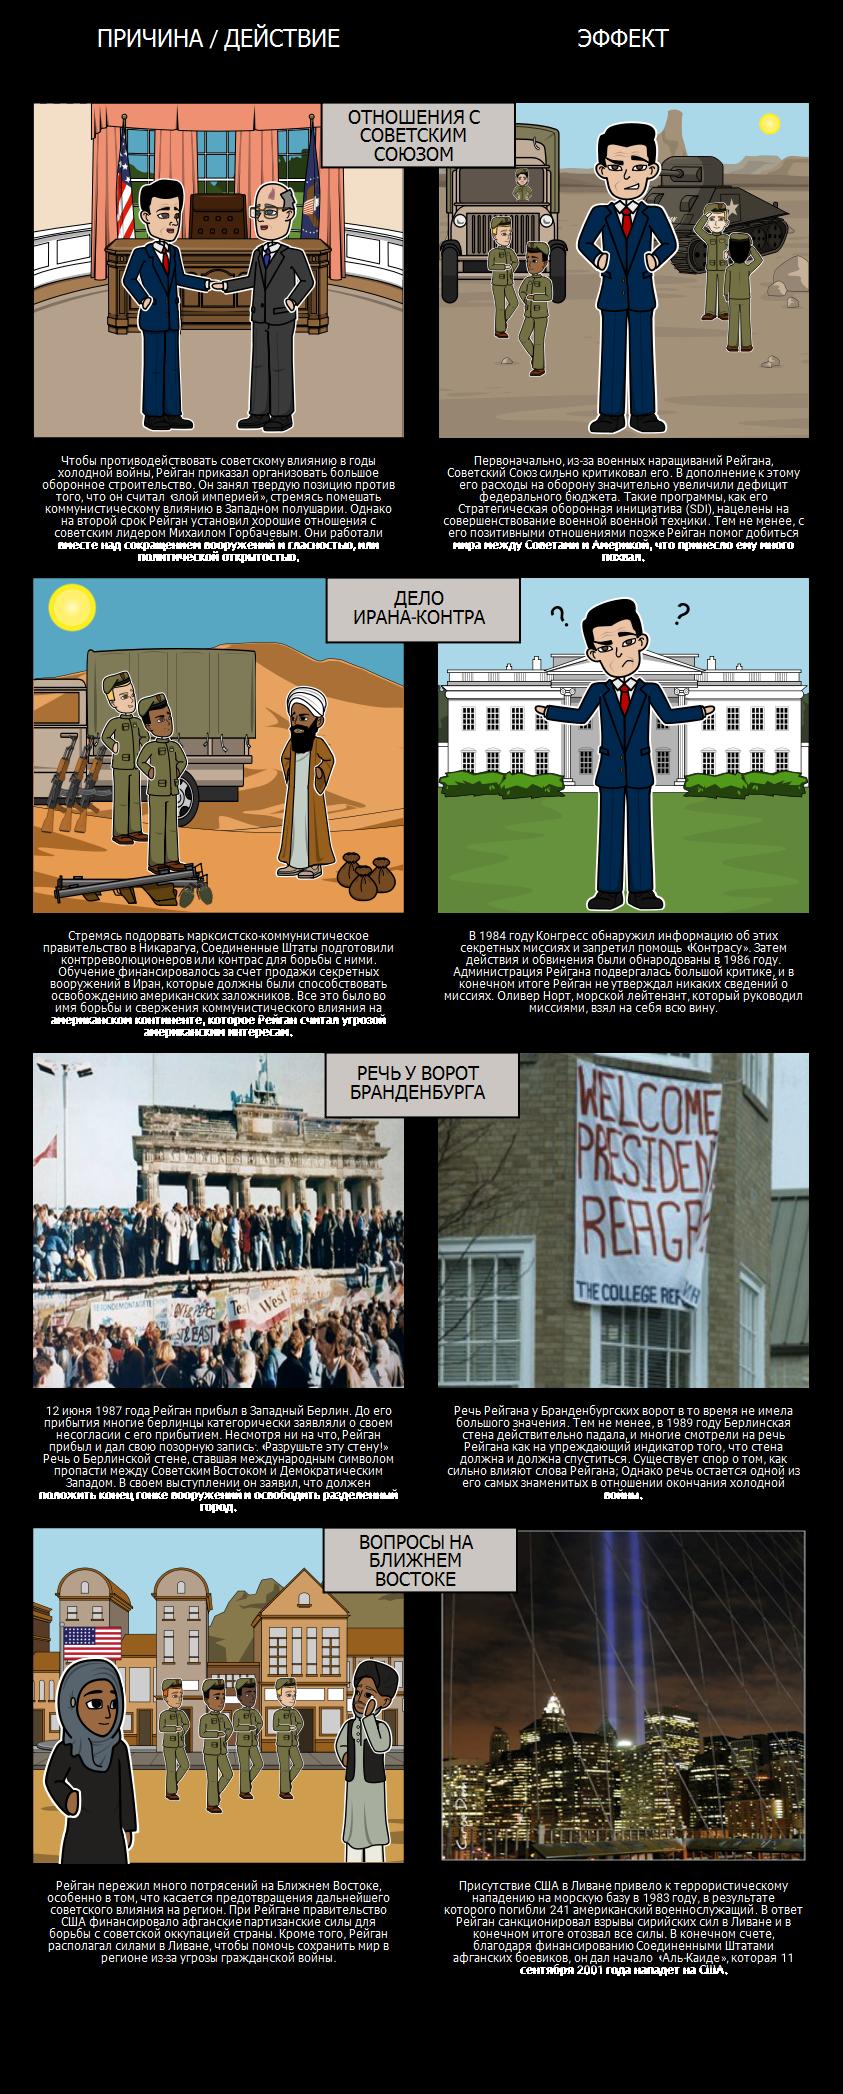 Рейган Президентство - Холодная Война